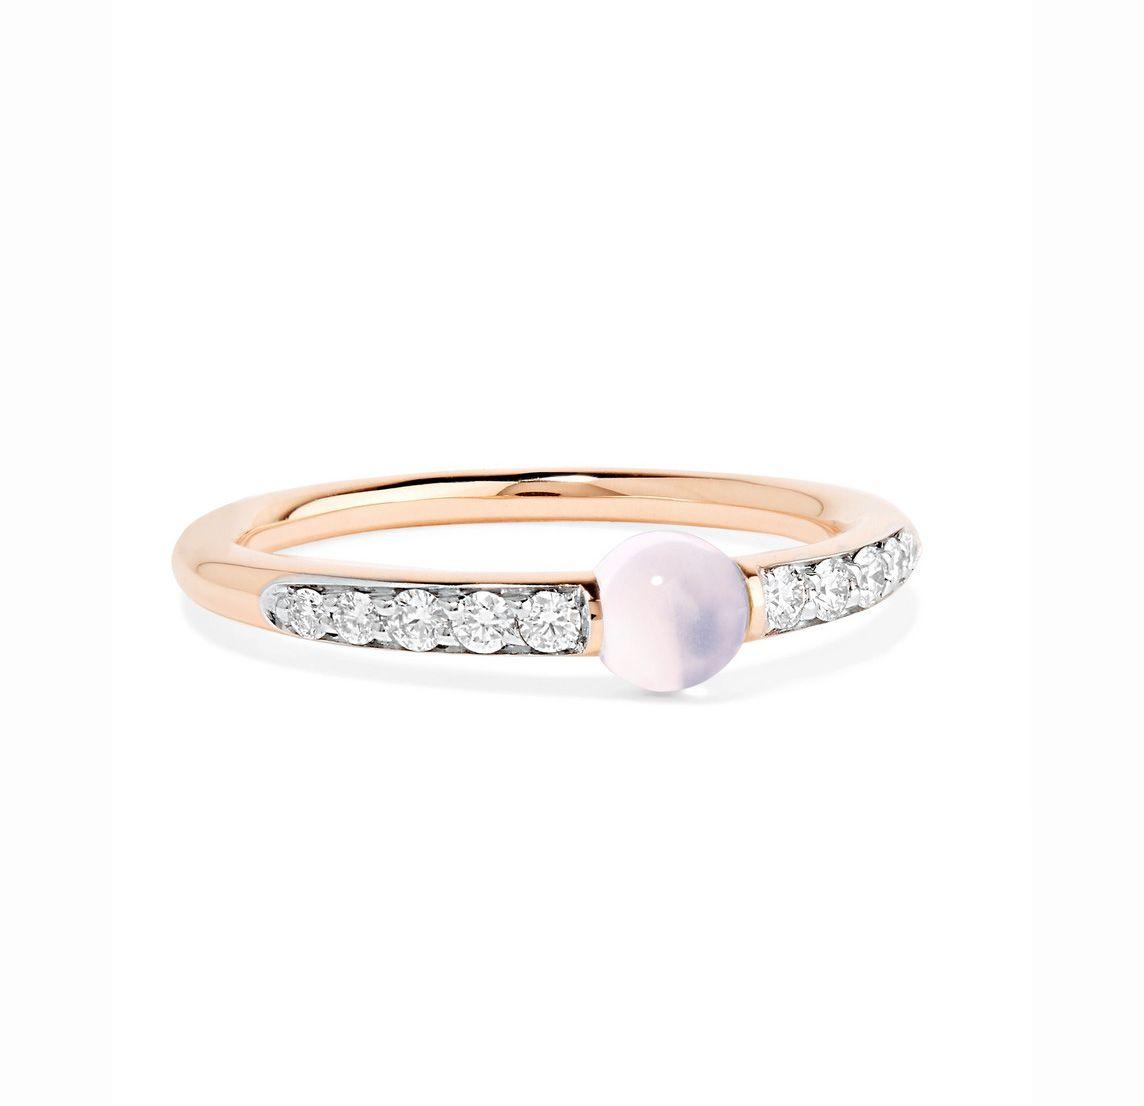 M'ama non M'ama moonstone & diamond ring